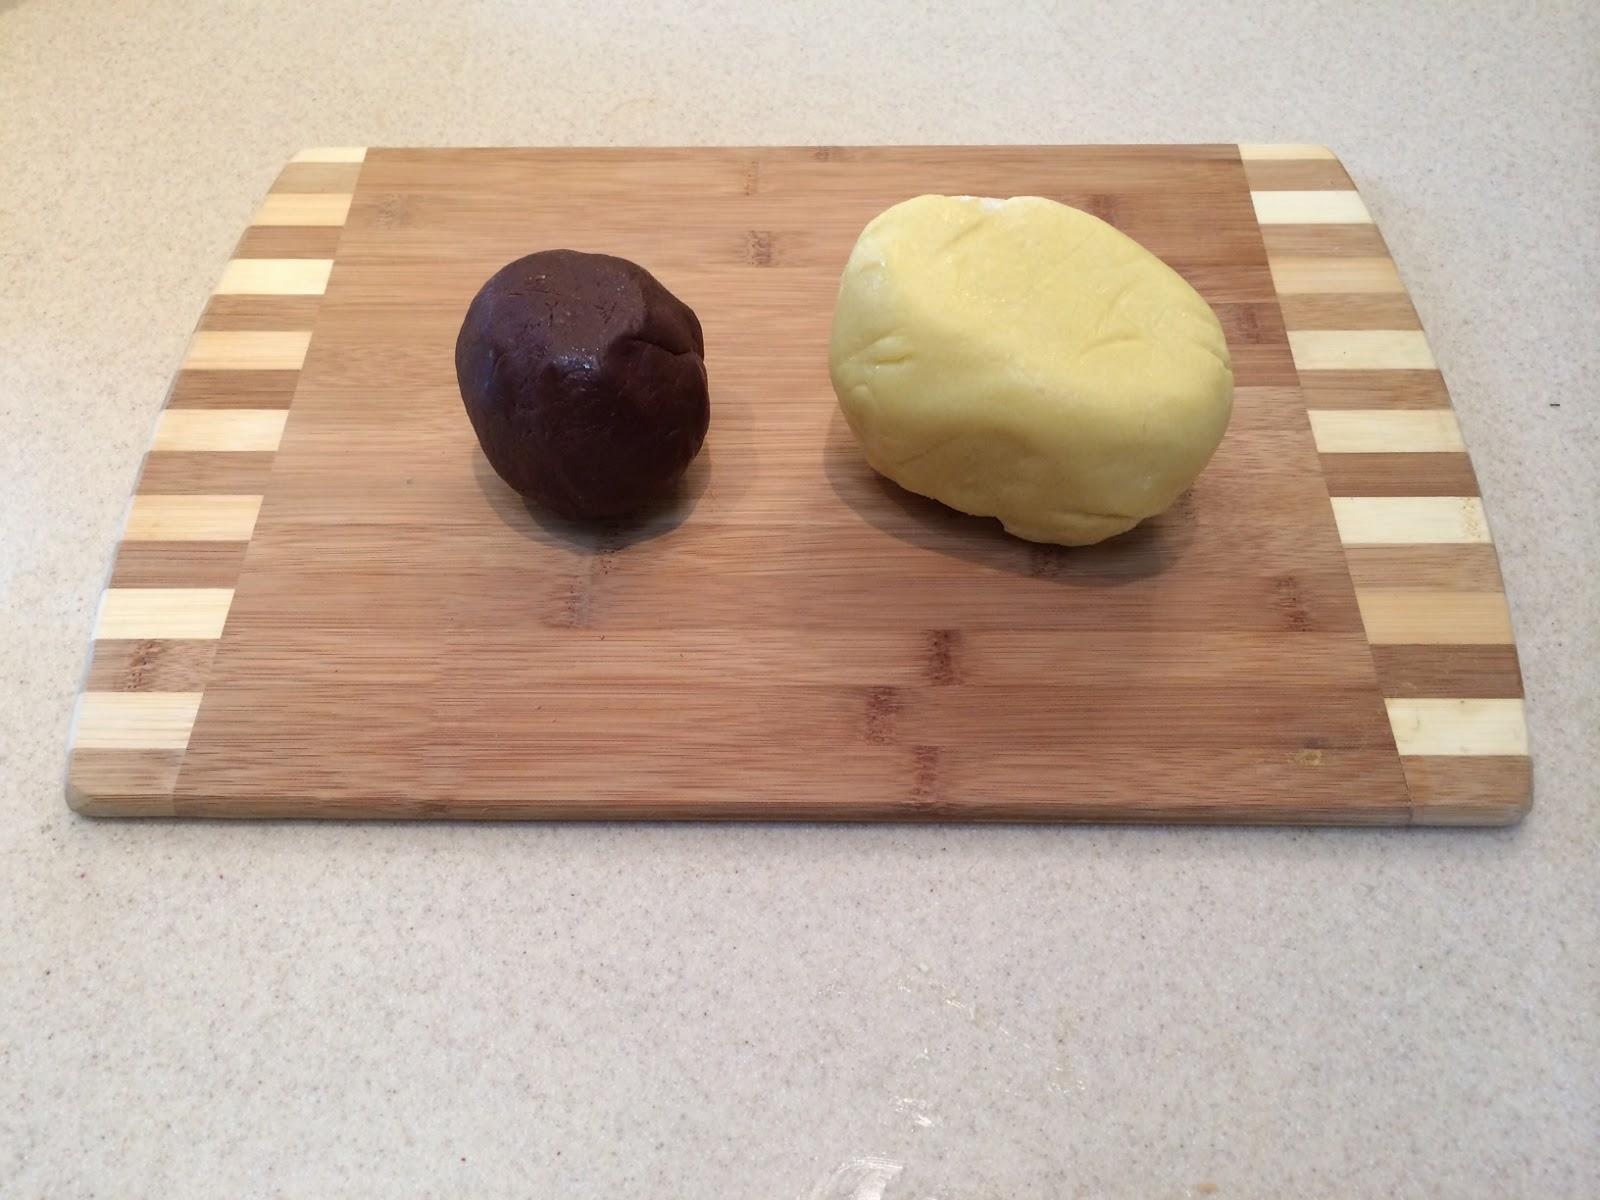 Шахматное масляное печенье (butter cookies)